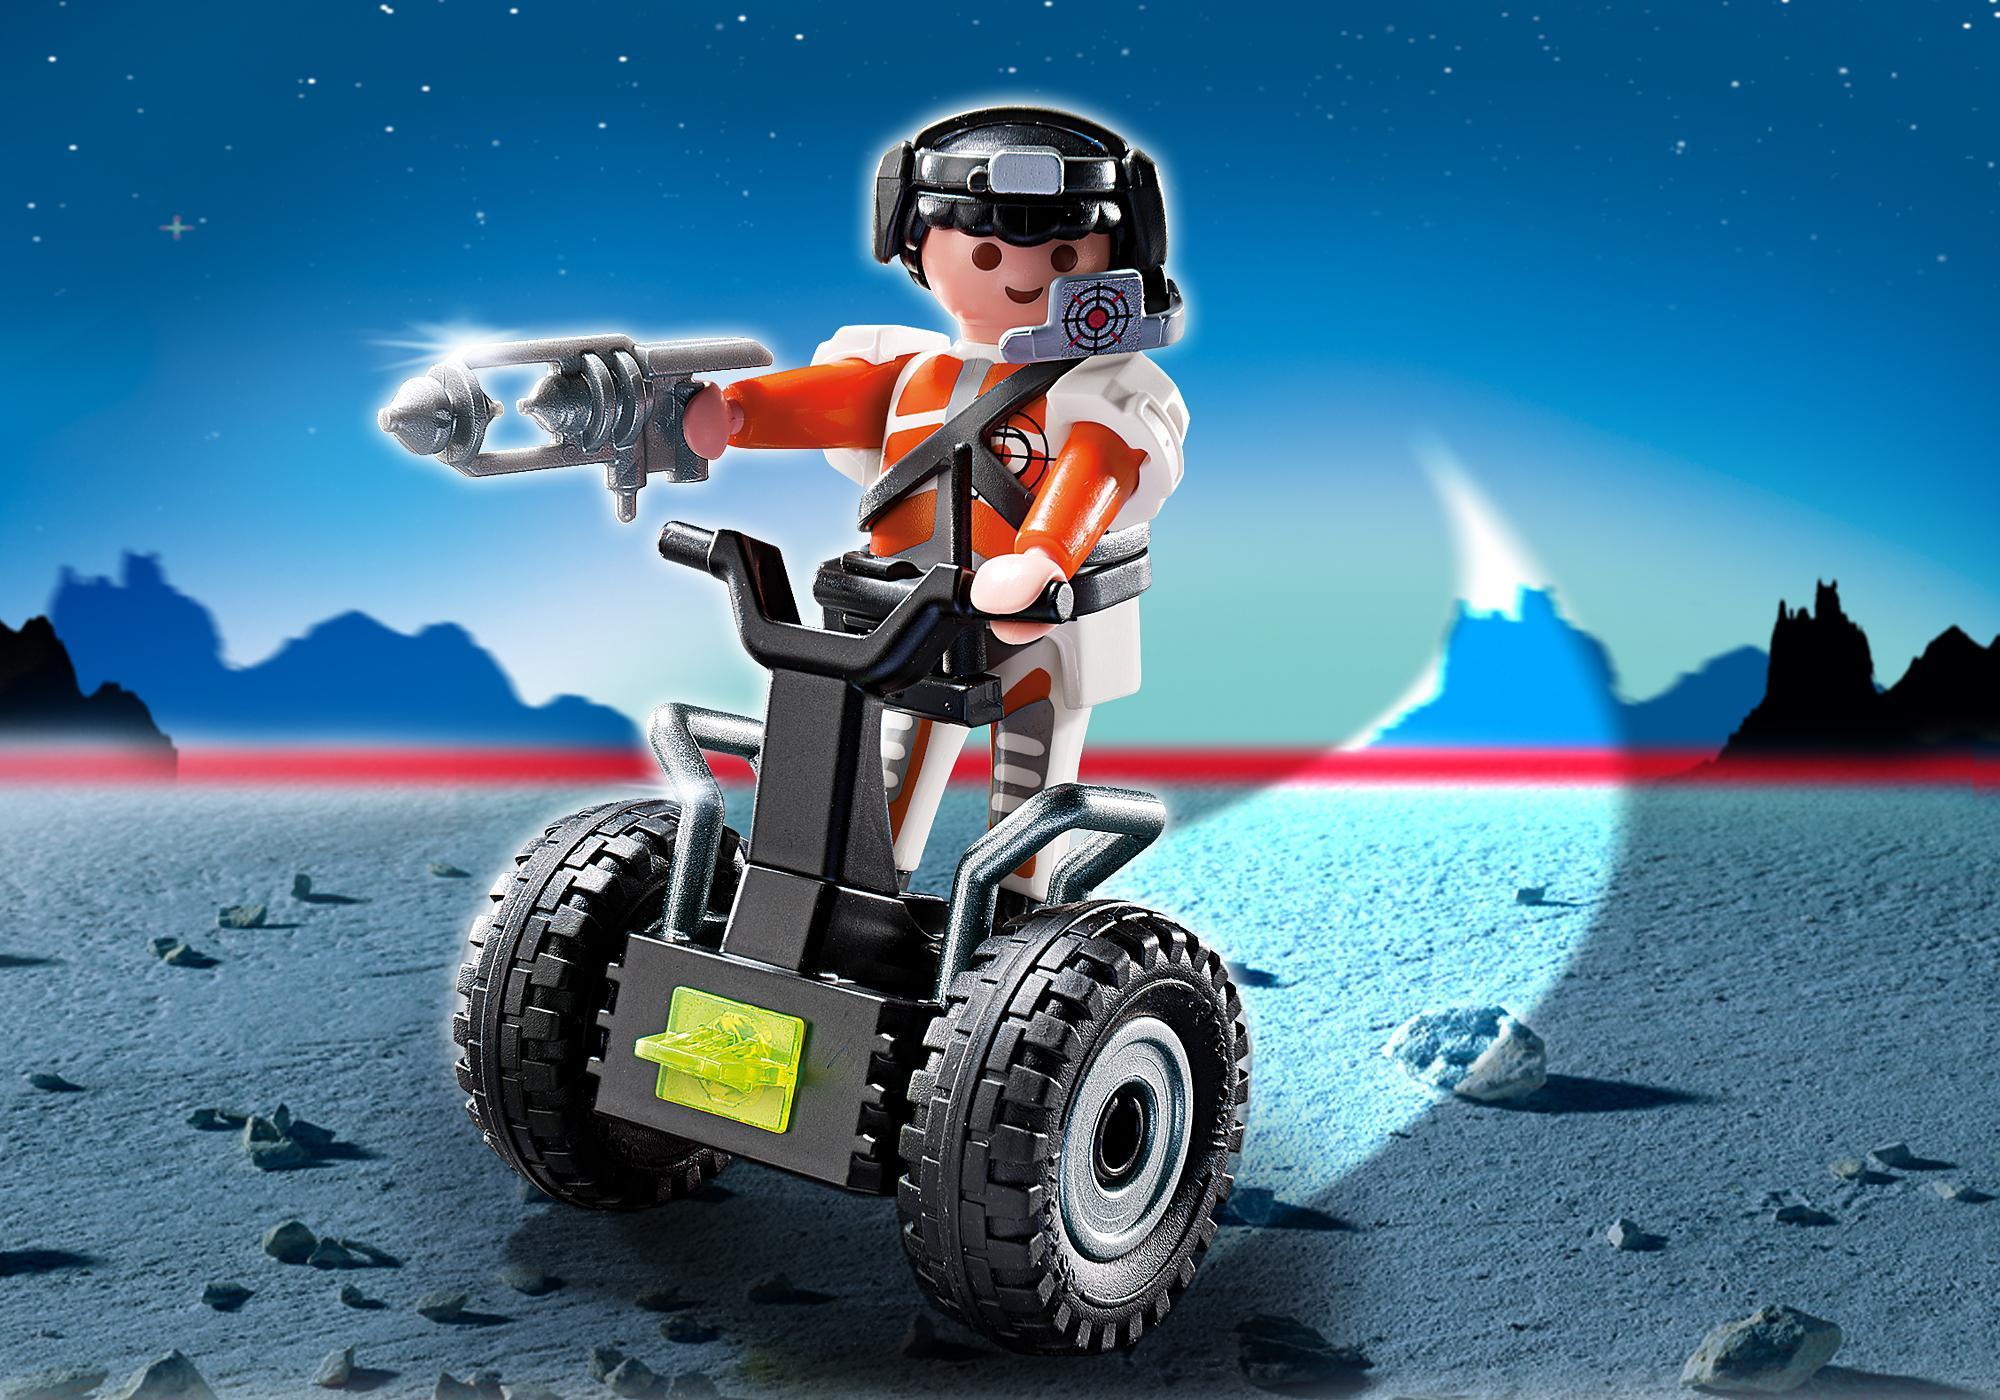 http://media.playmobil.com/i/playmobil/5296_product_detail/Top Agent mit Balance-Racer